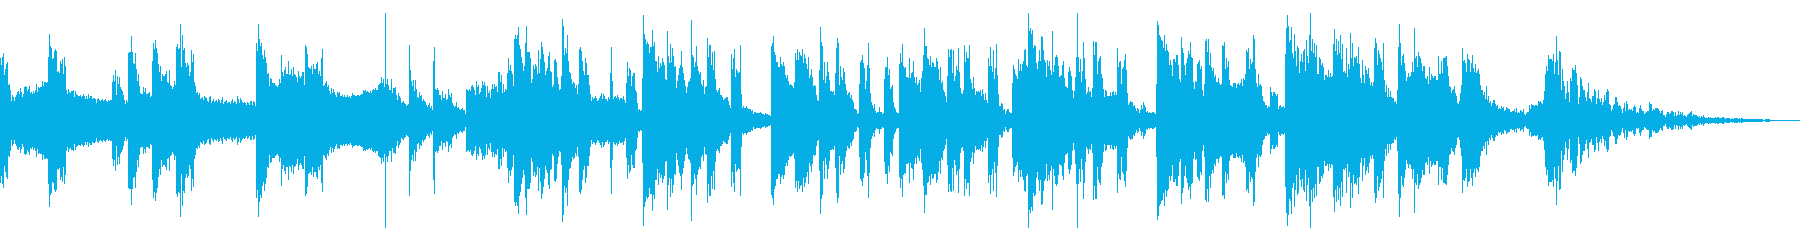 SunsetOnTheBeach 30秒の再生済みの波形